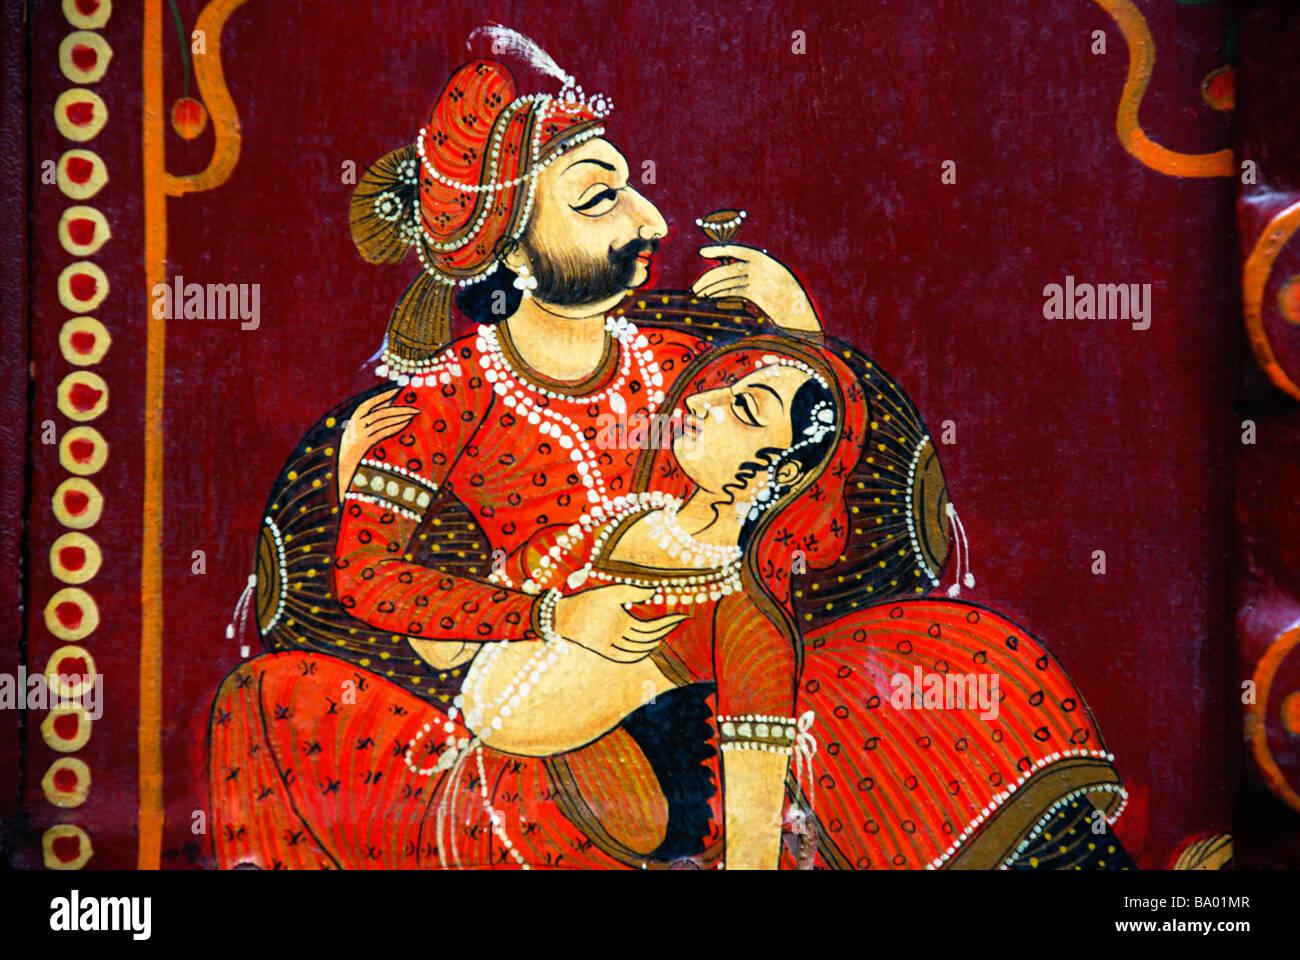 Rajasthani Pittura su vetro, stato del Rajasthan, India. Immagini Stock